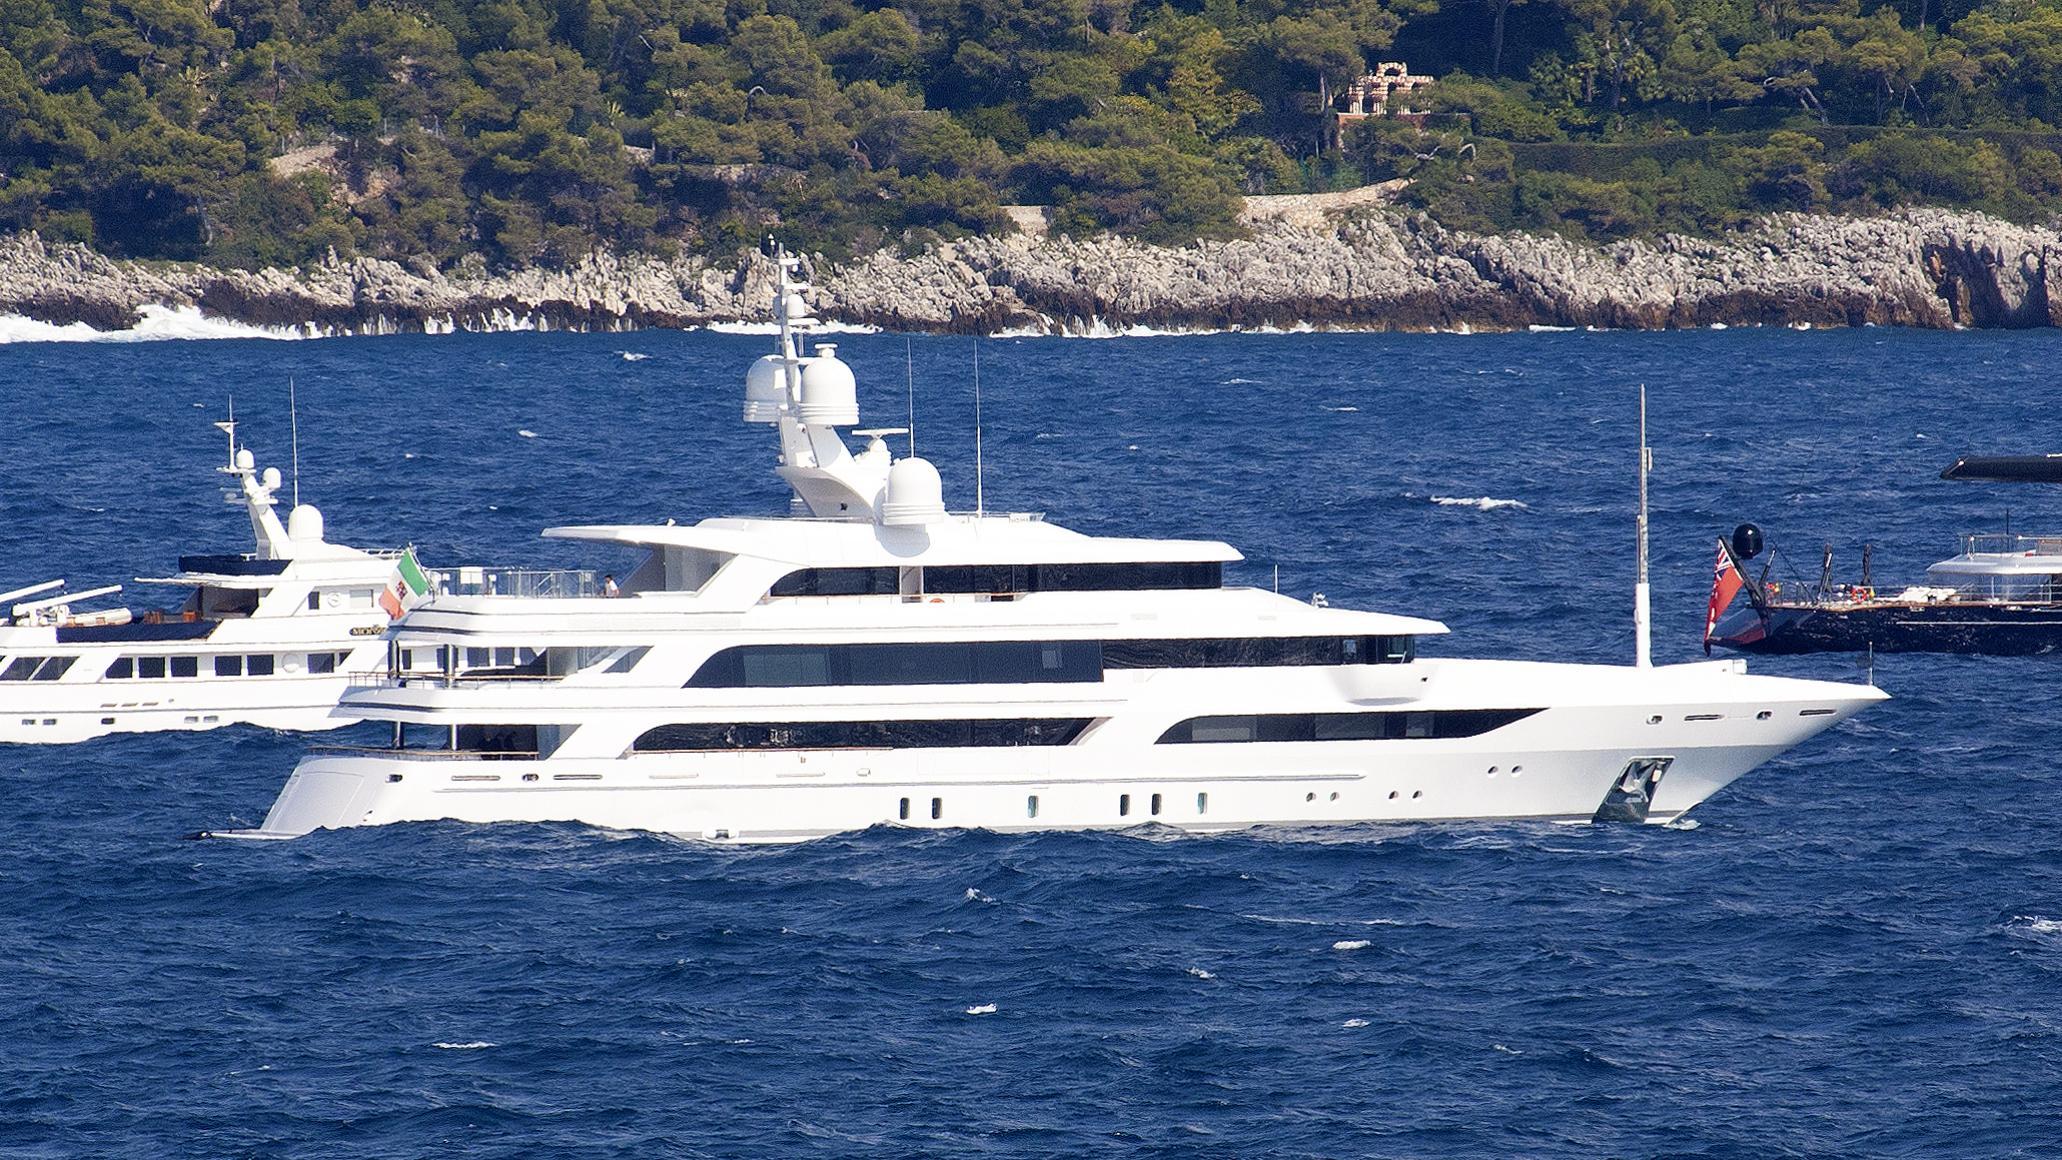 waku-benetti-fb-24-motor-yacht-2015-63m-profile